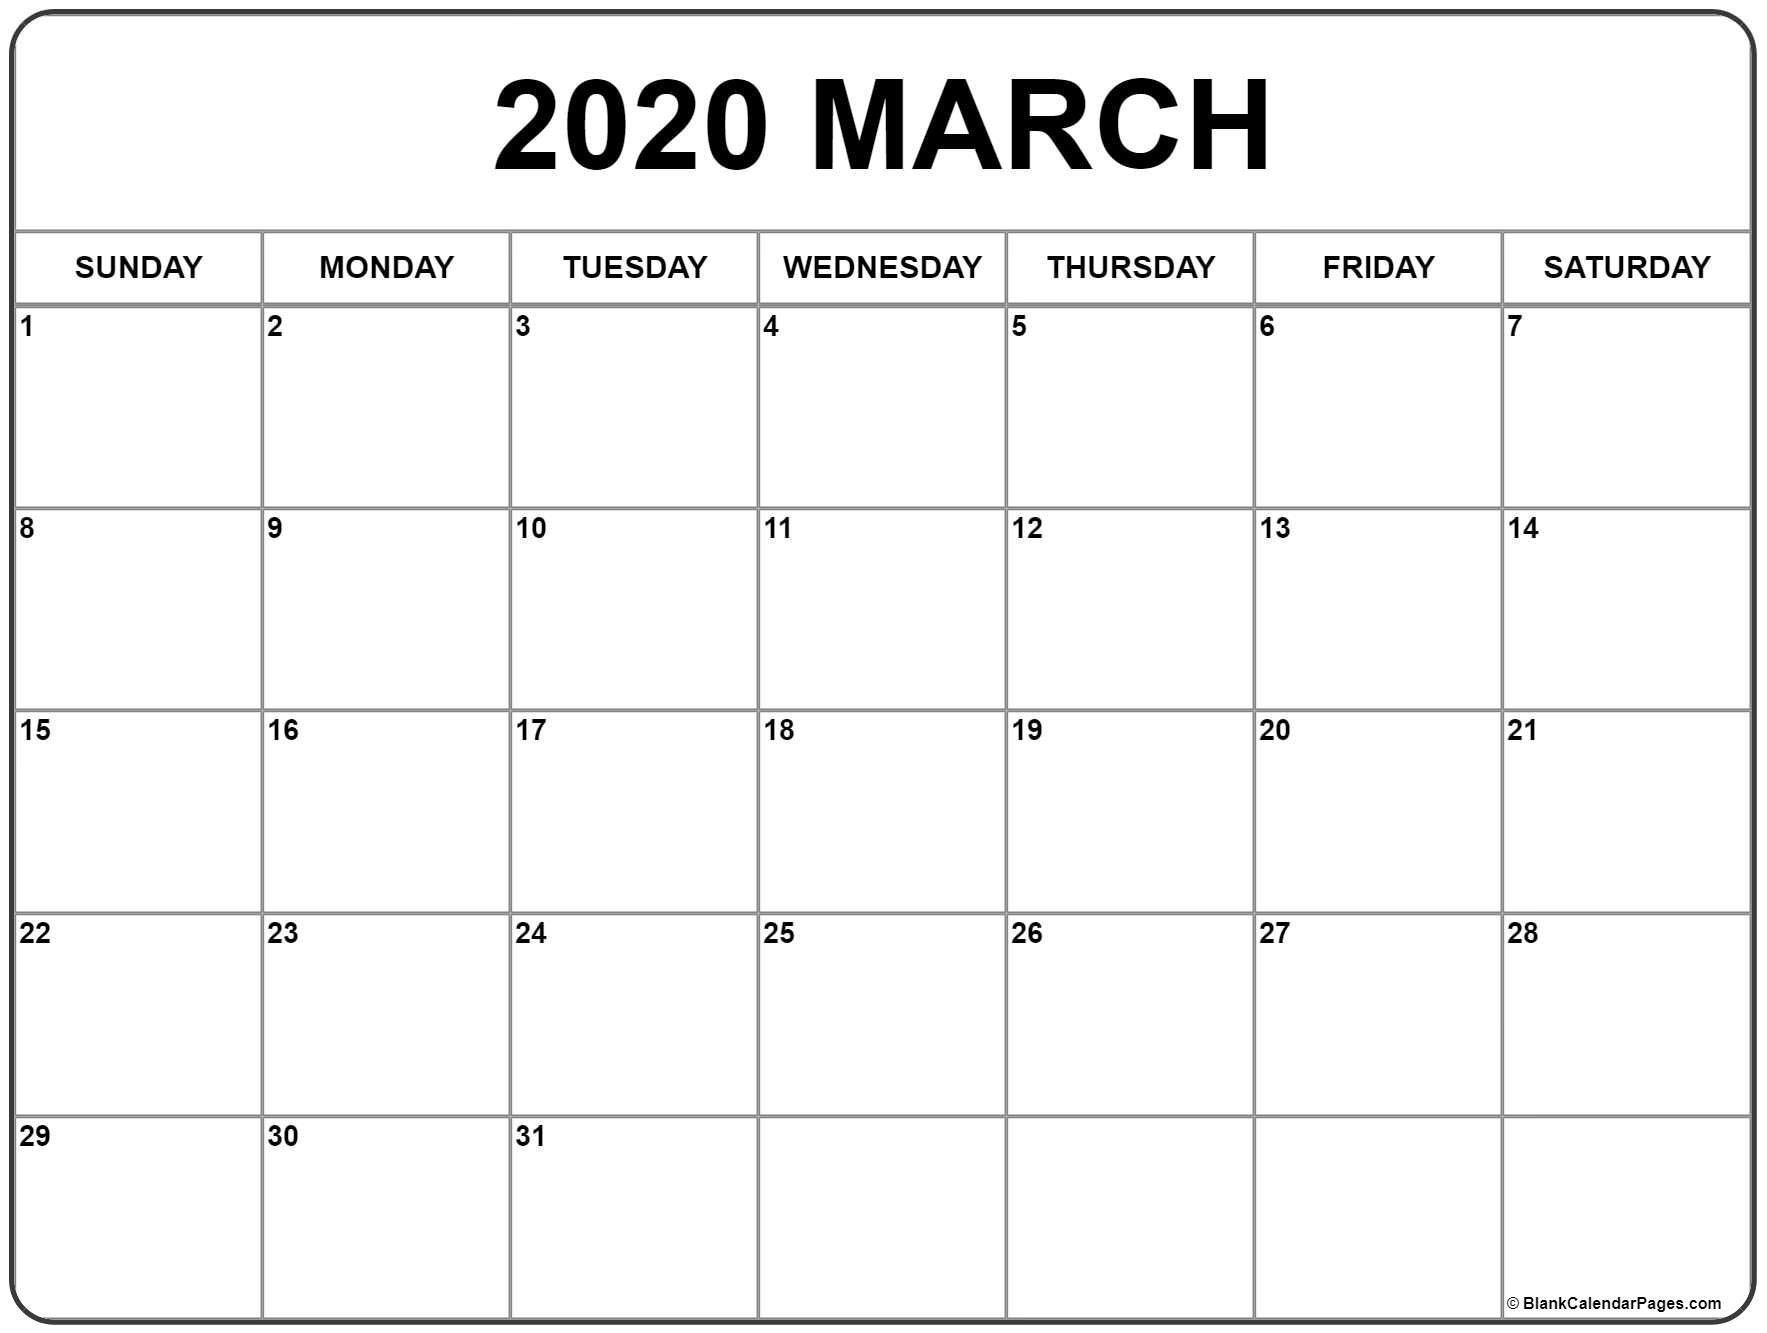 Print March 2020 Calendar Blank | Blank Calendar Pages